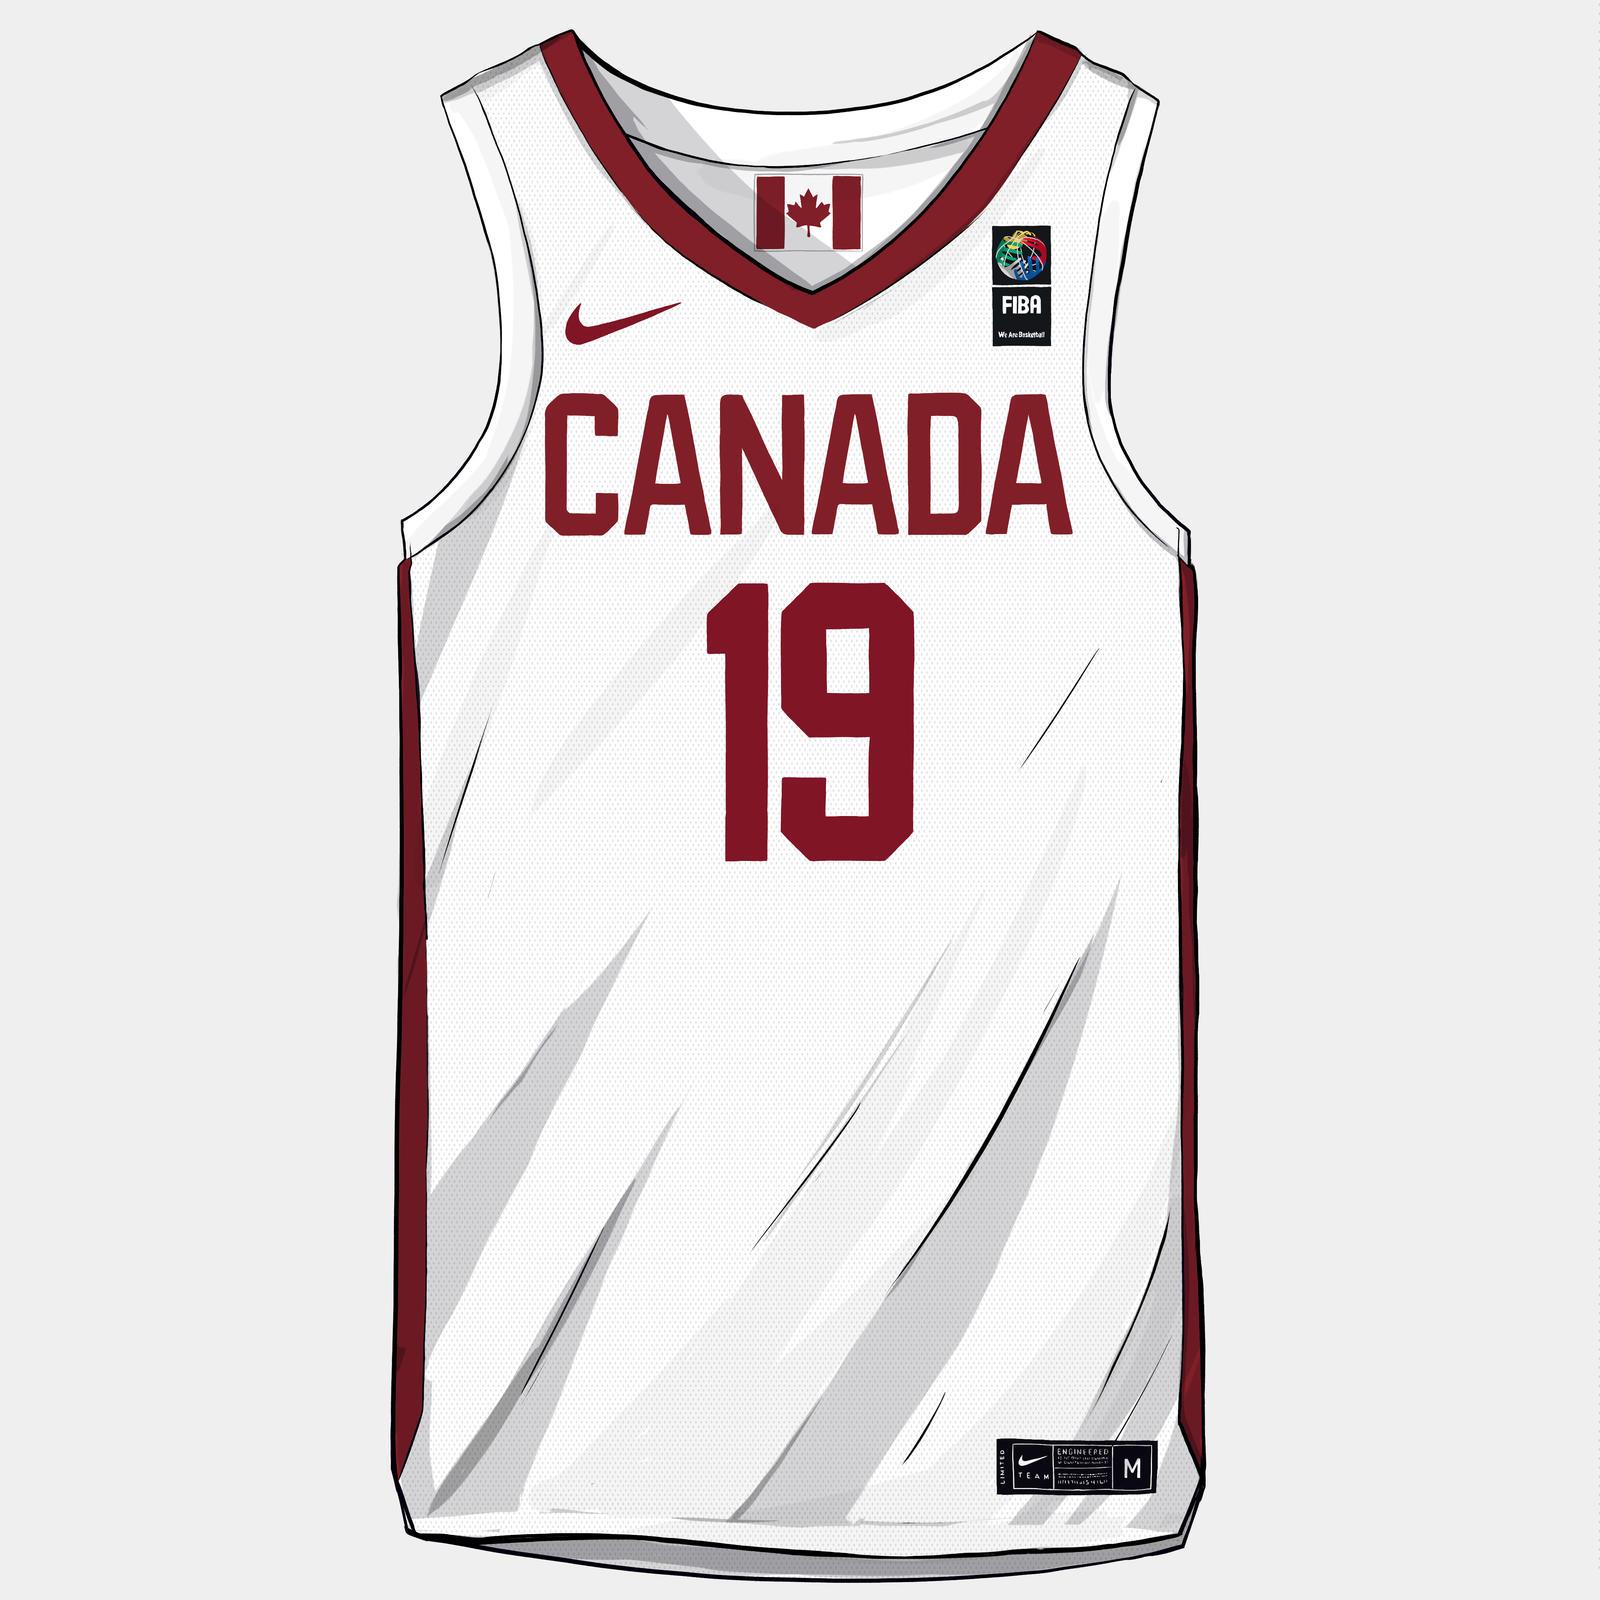 nike-news-canada-national-team-kit-2019-illustration-1x1_2_89519.jpg